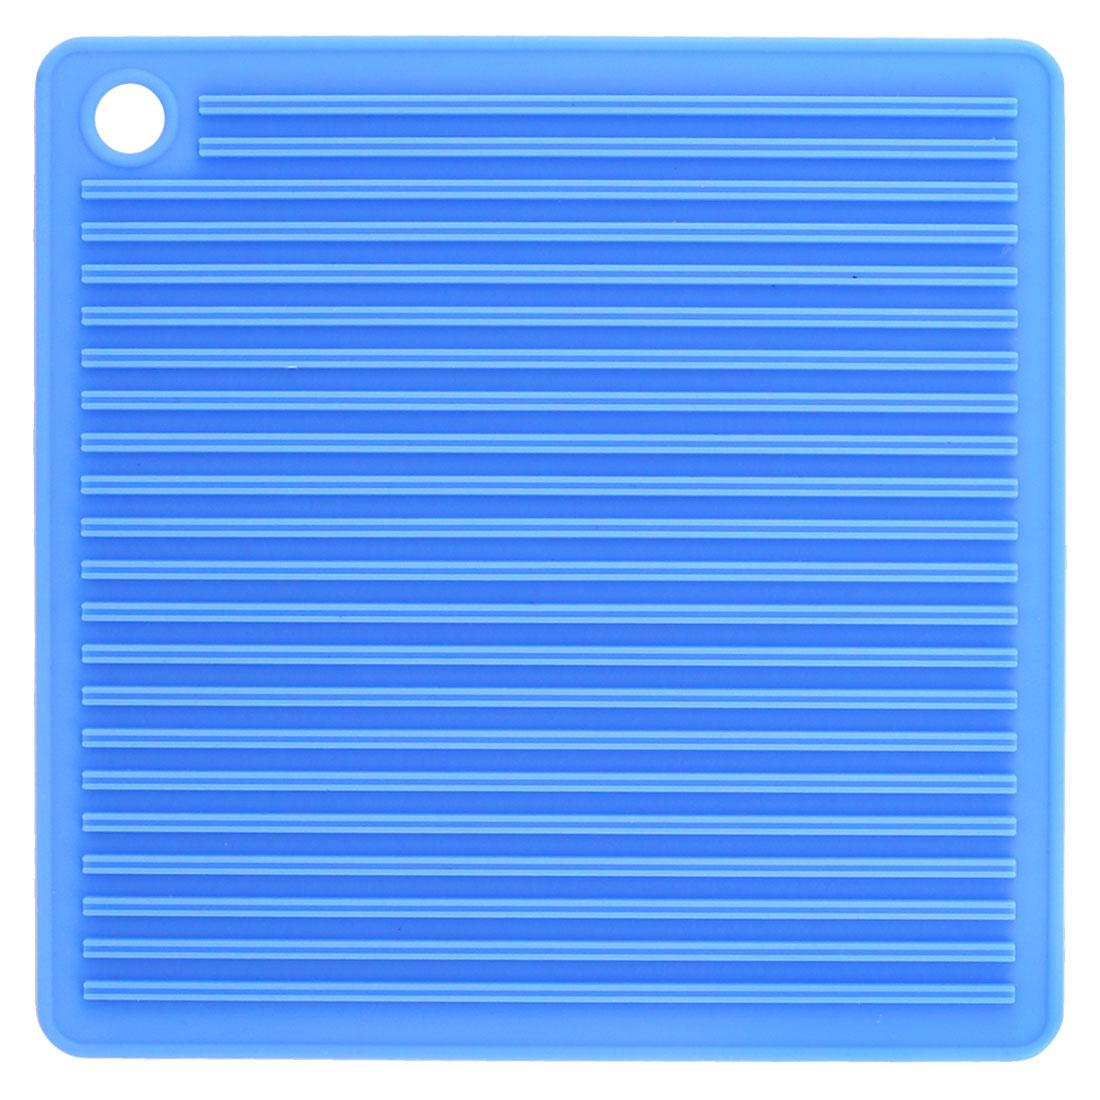 Pubs Rubber Nonslip Heat Resistance Teacup Mug Cup Mat Pot Coaster Pad Holder Blue